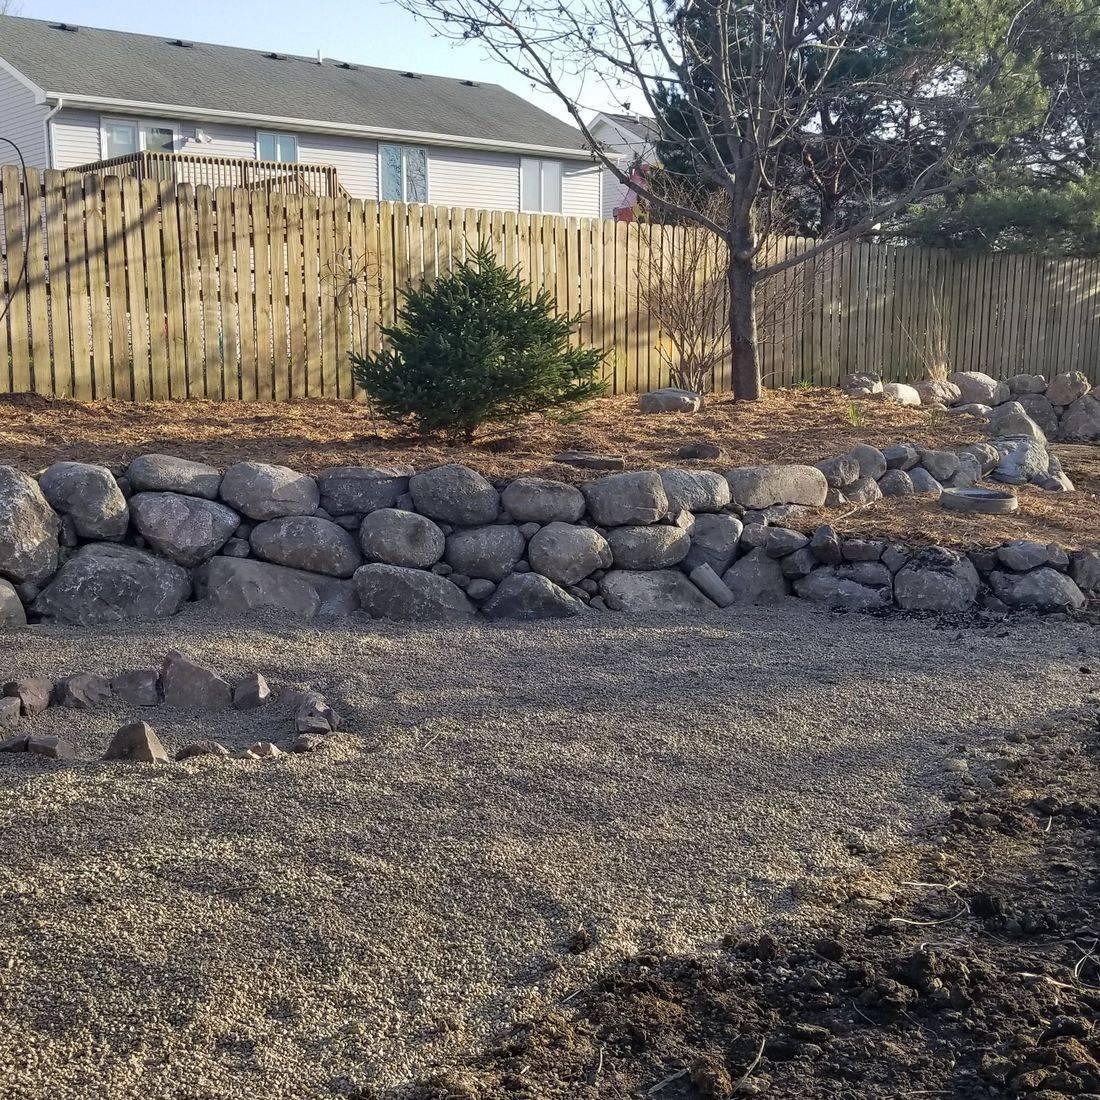 Boone, Iowa, landscaping, Landscaping  iowa, Landscaping boone